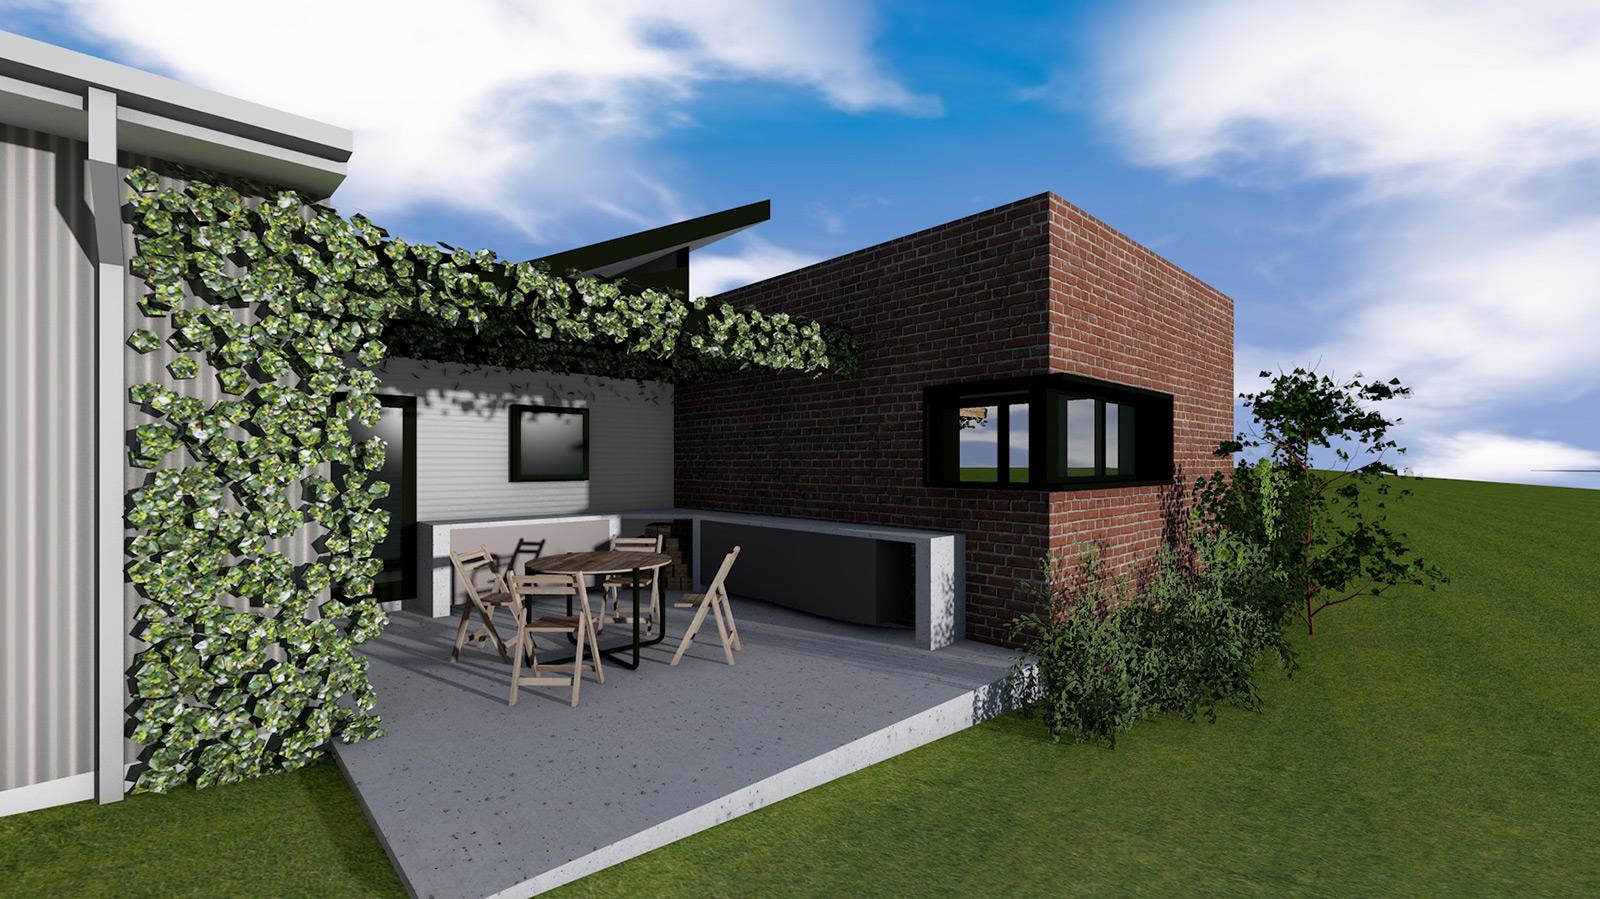 YUNDI_brick-option-render-2.jpg